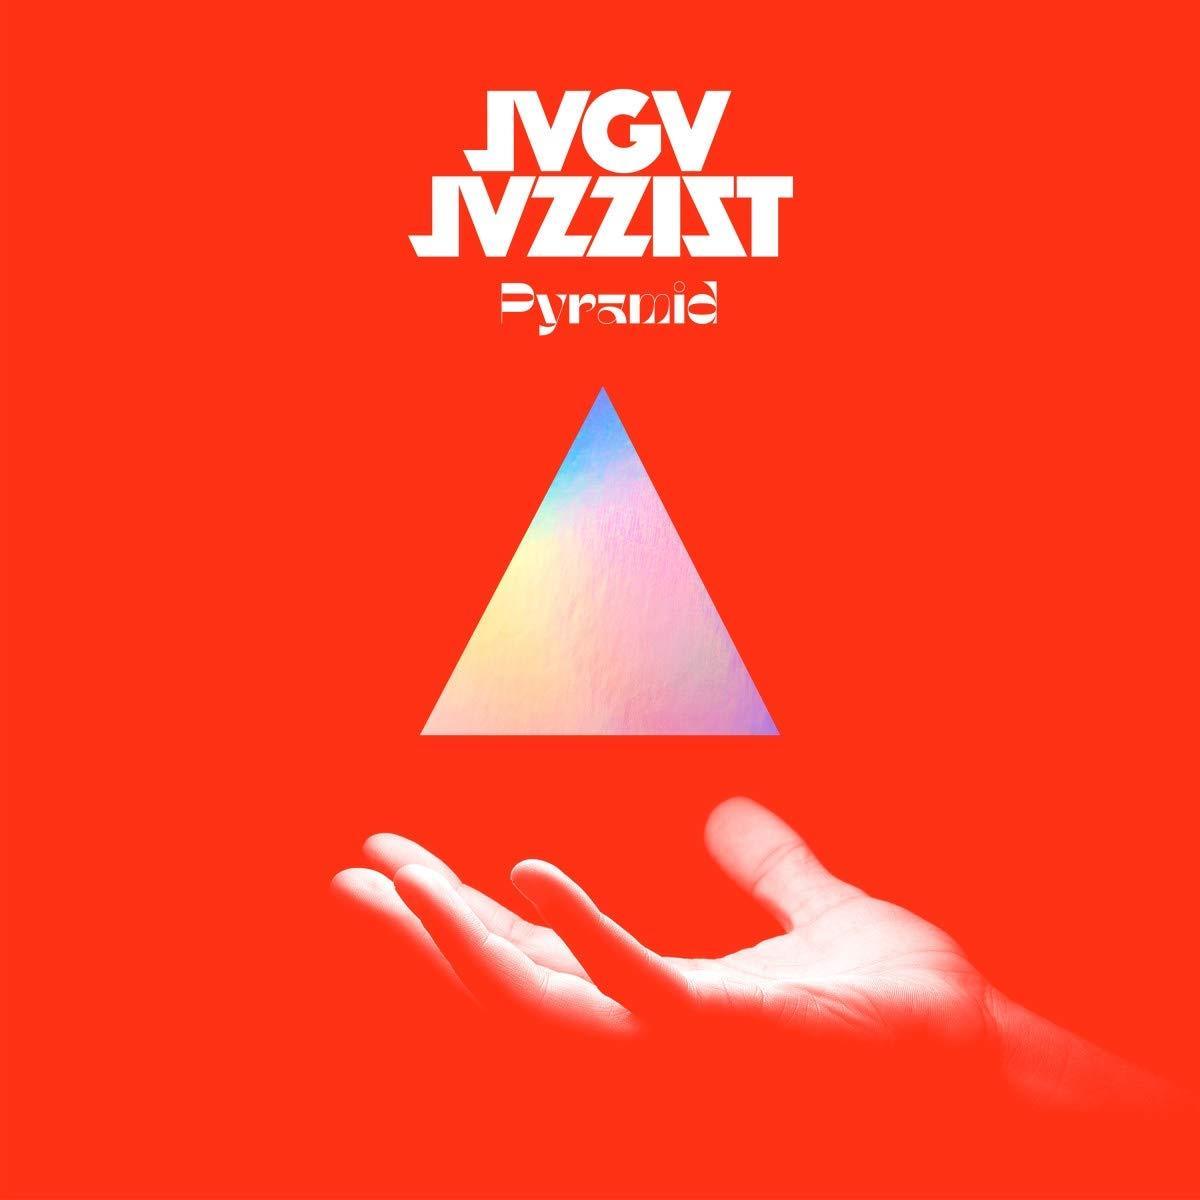 Jaga Jazzist – Pyramid [LP]